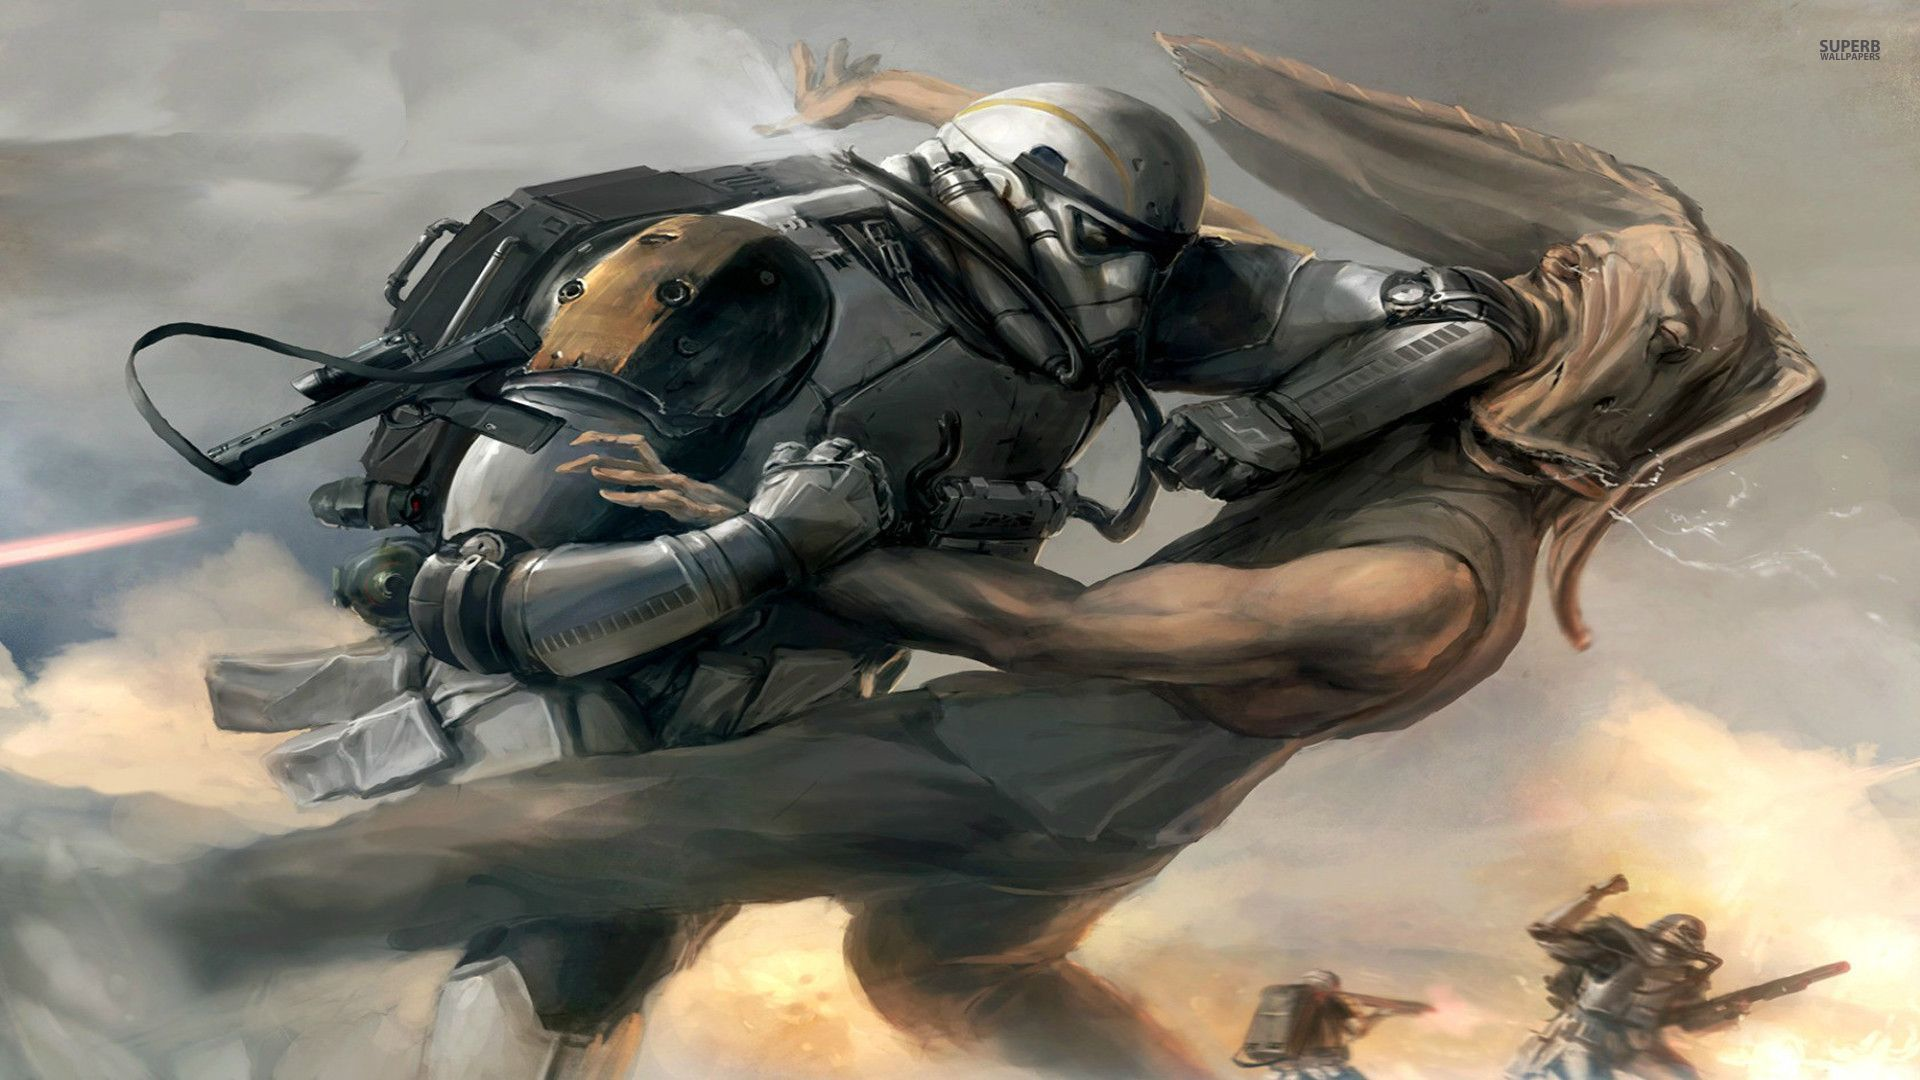 epic star wars trooper wallpaper - photo #13